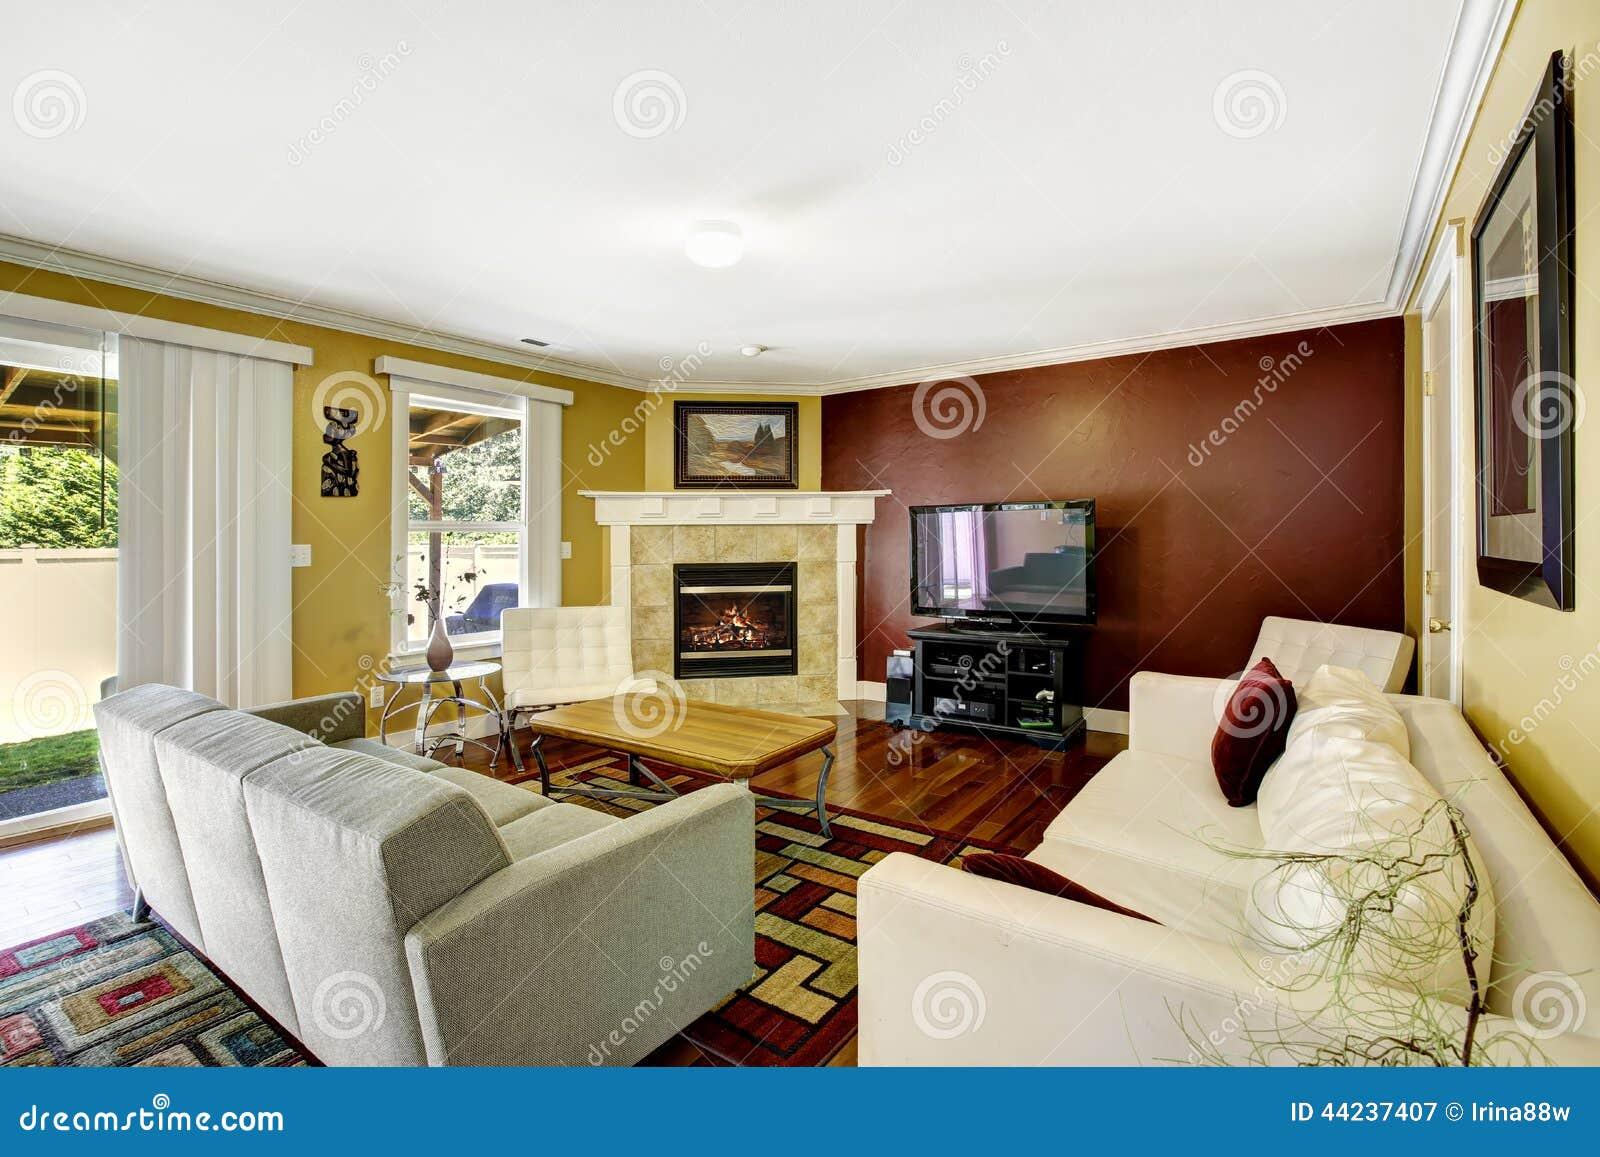 home-interior-contrast-color-walls-house-bright-contranst-white-grey ...